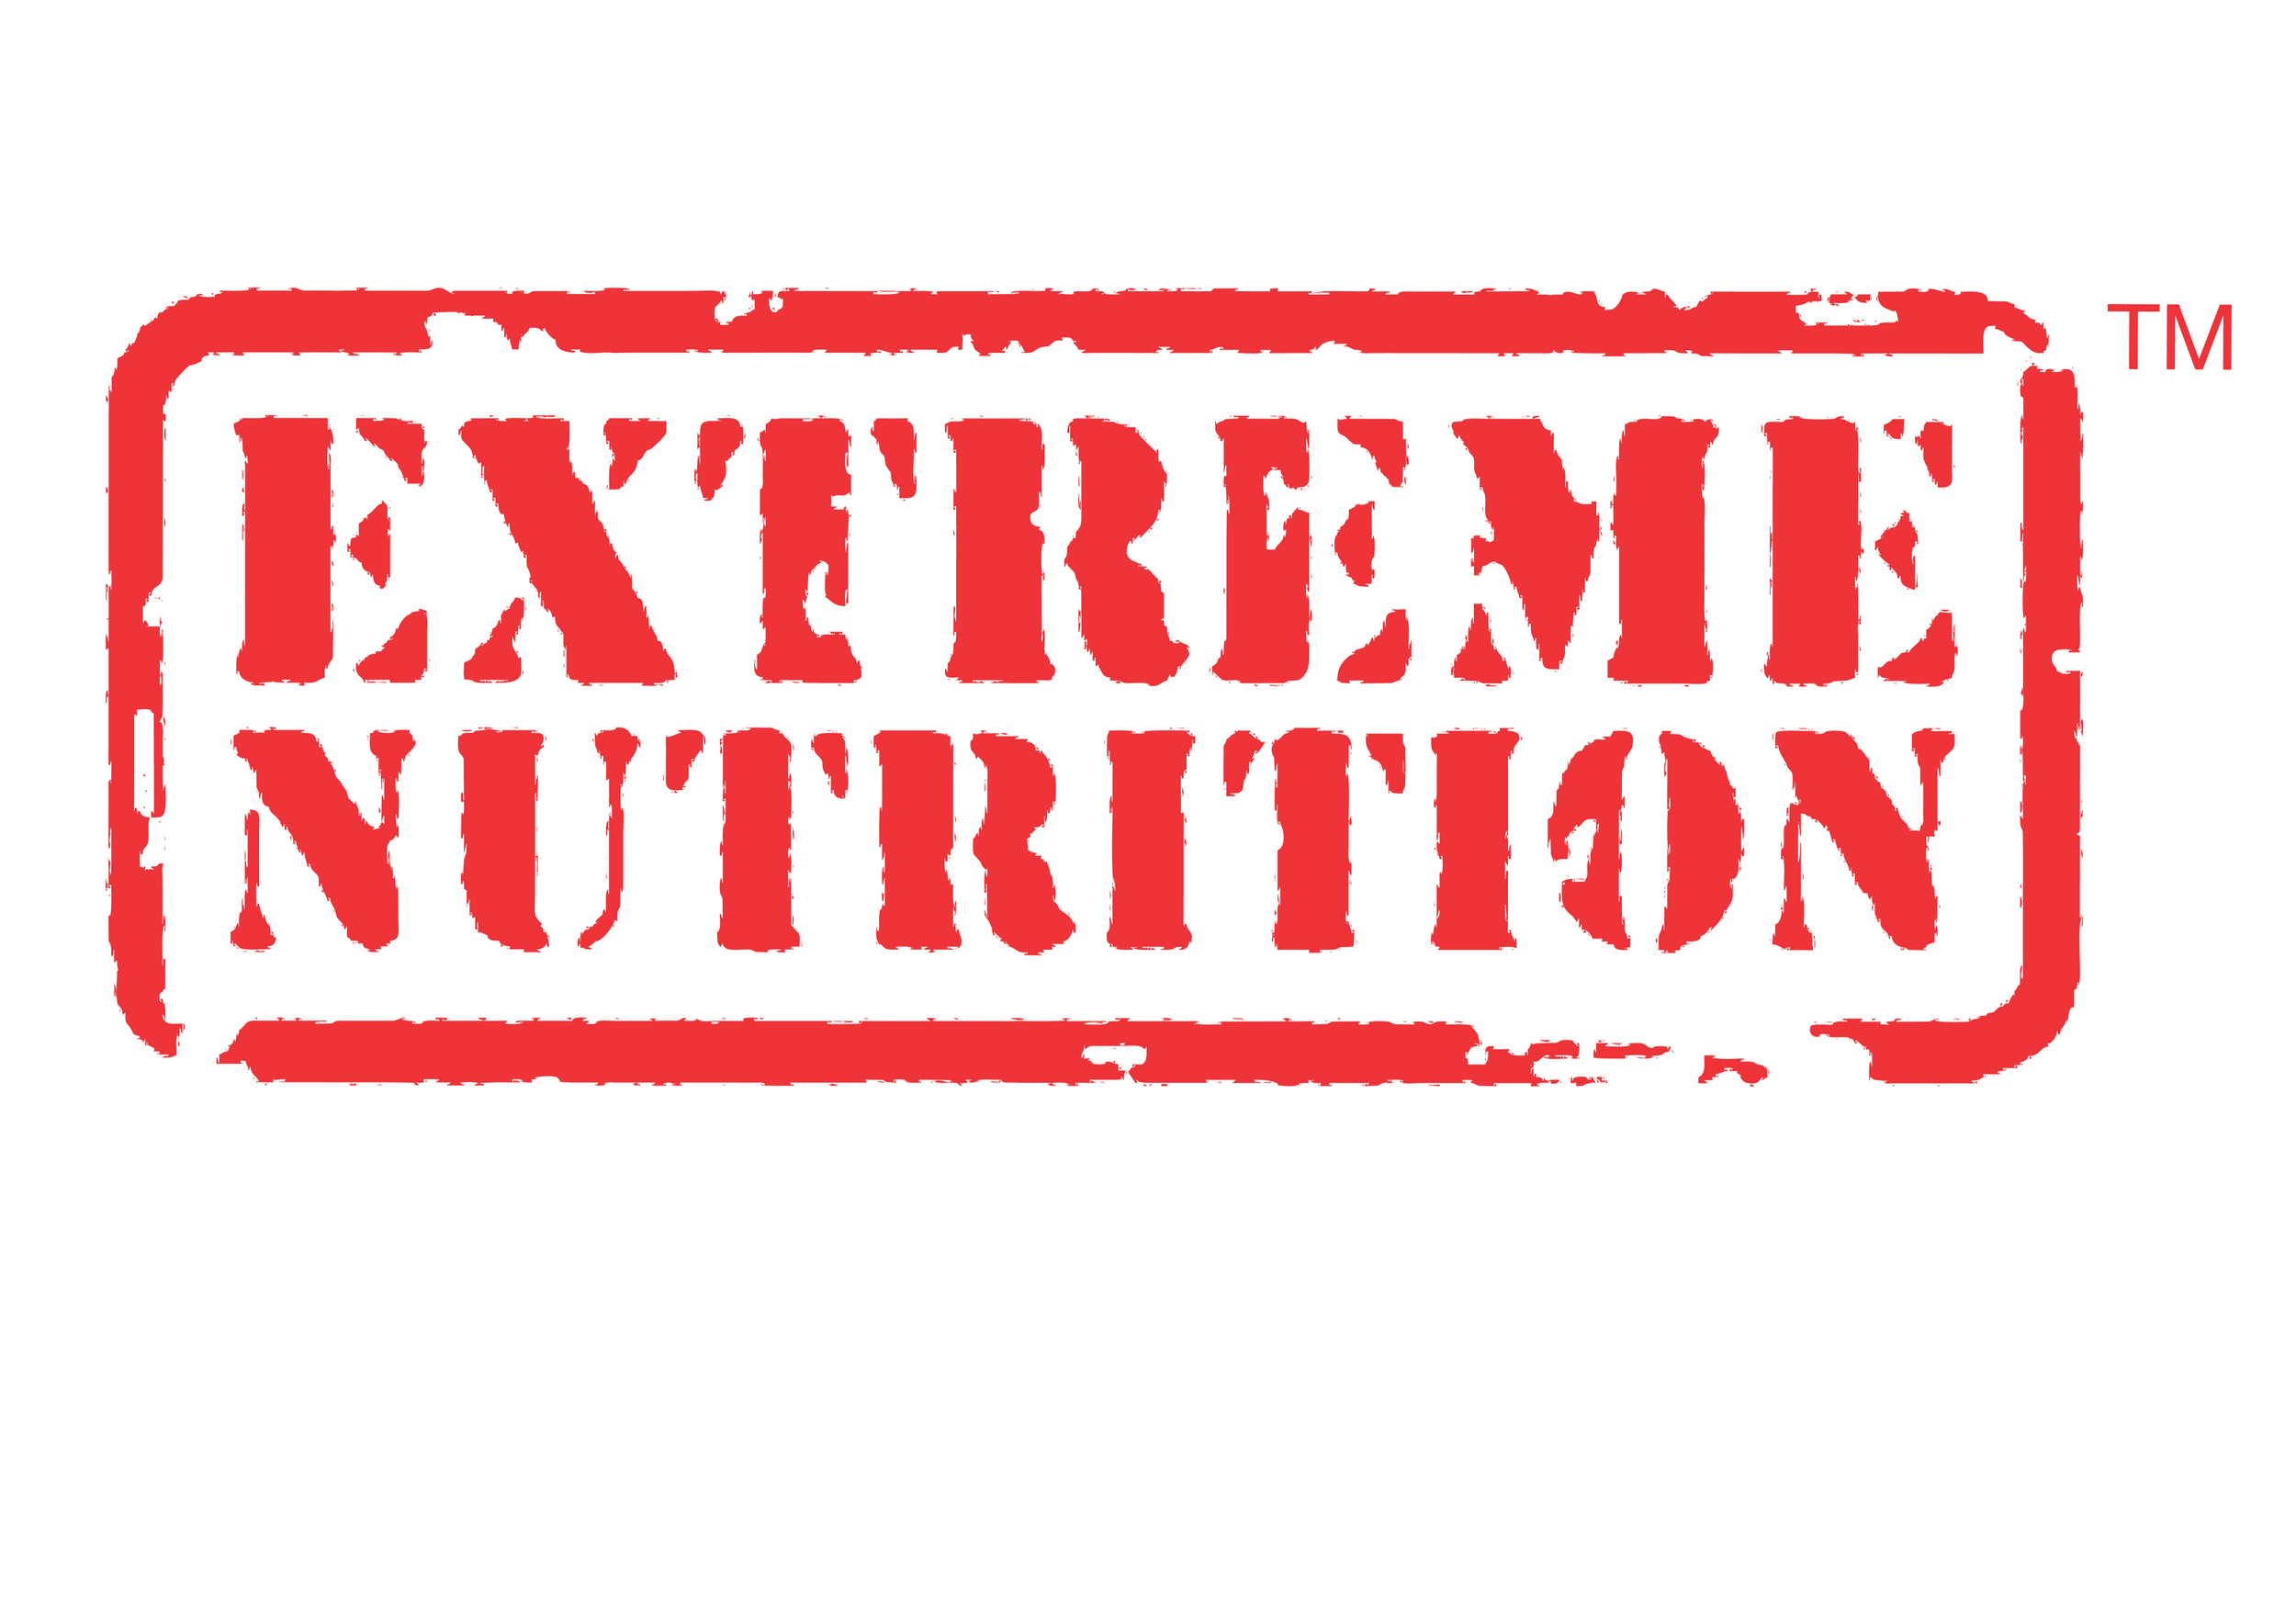 Extreme Nutrition  white 1.4MB.jpg